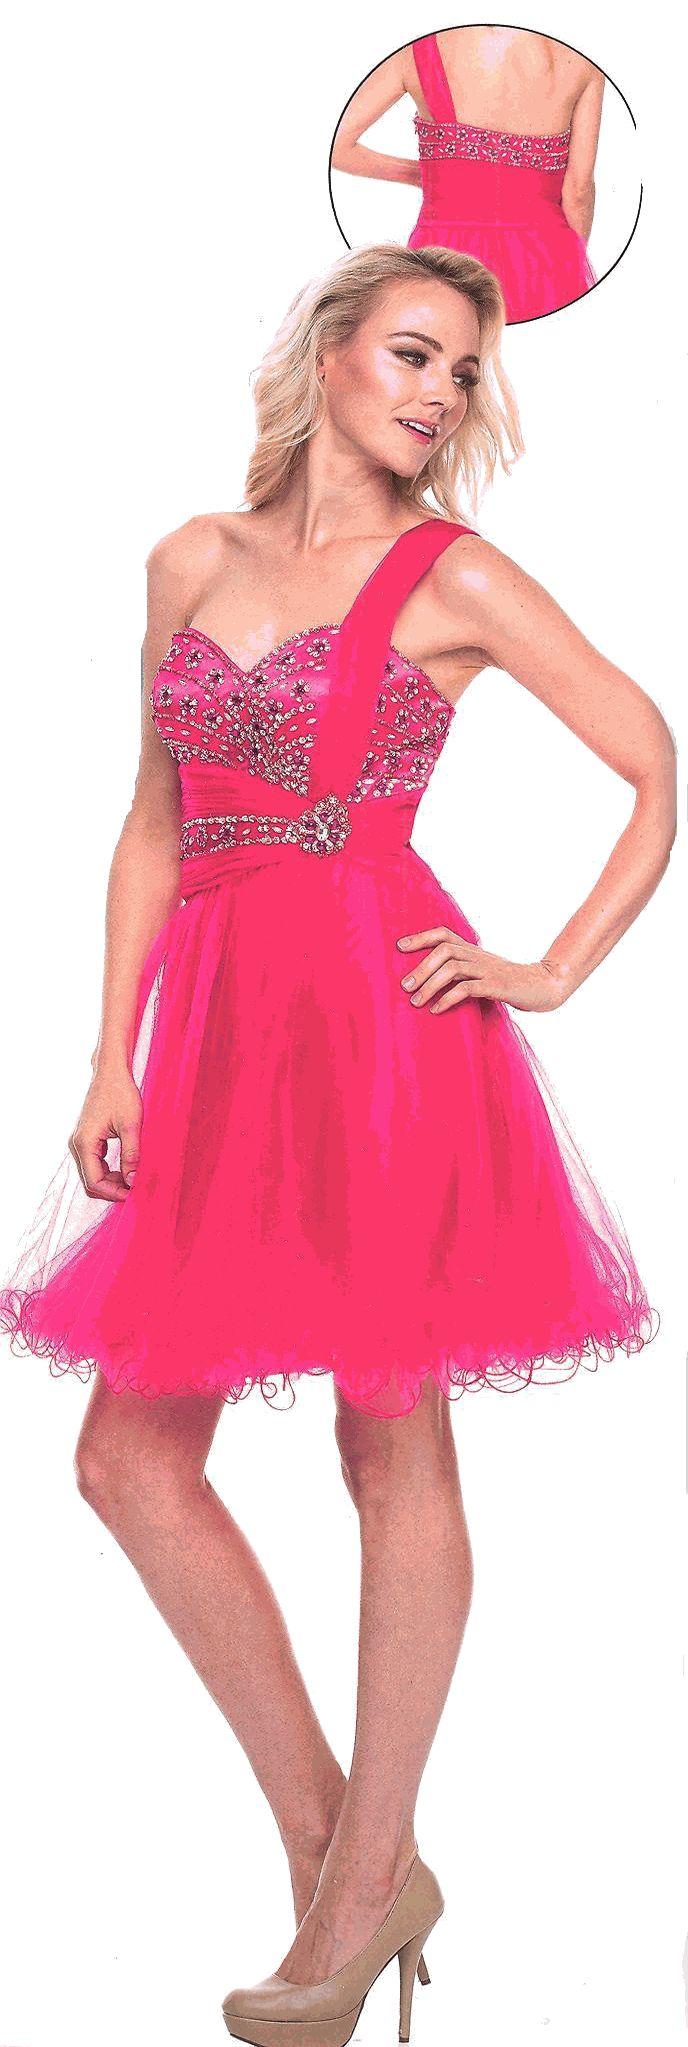 Mejores 81 imágenes de pretty dresses en Pinterest | Vestidos de ...